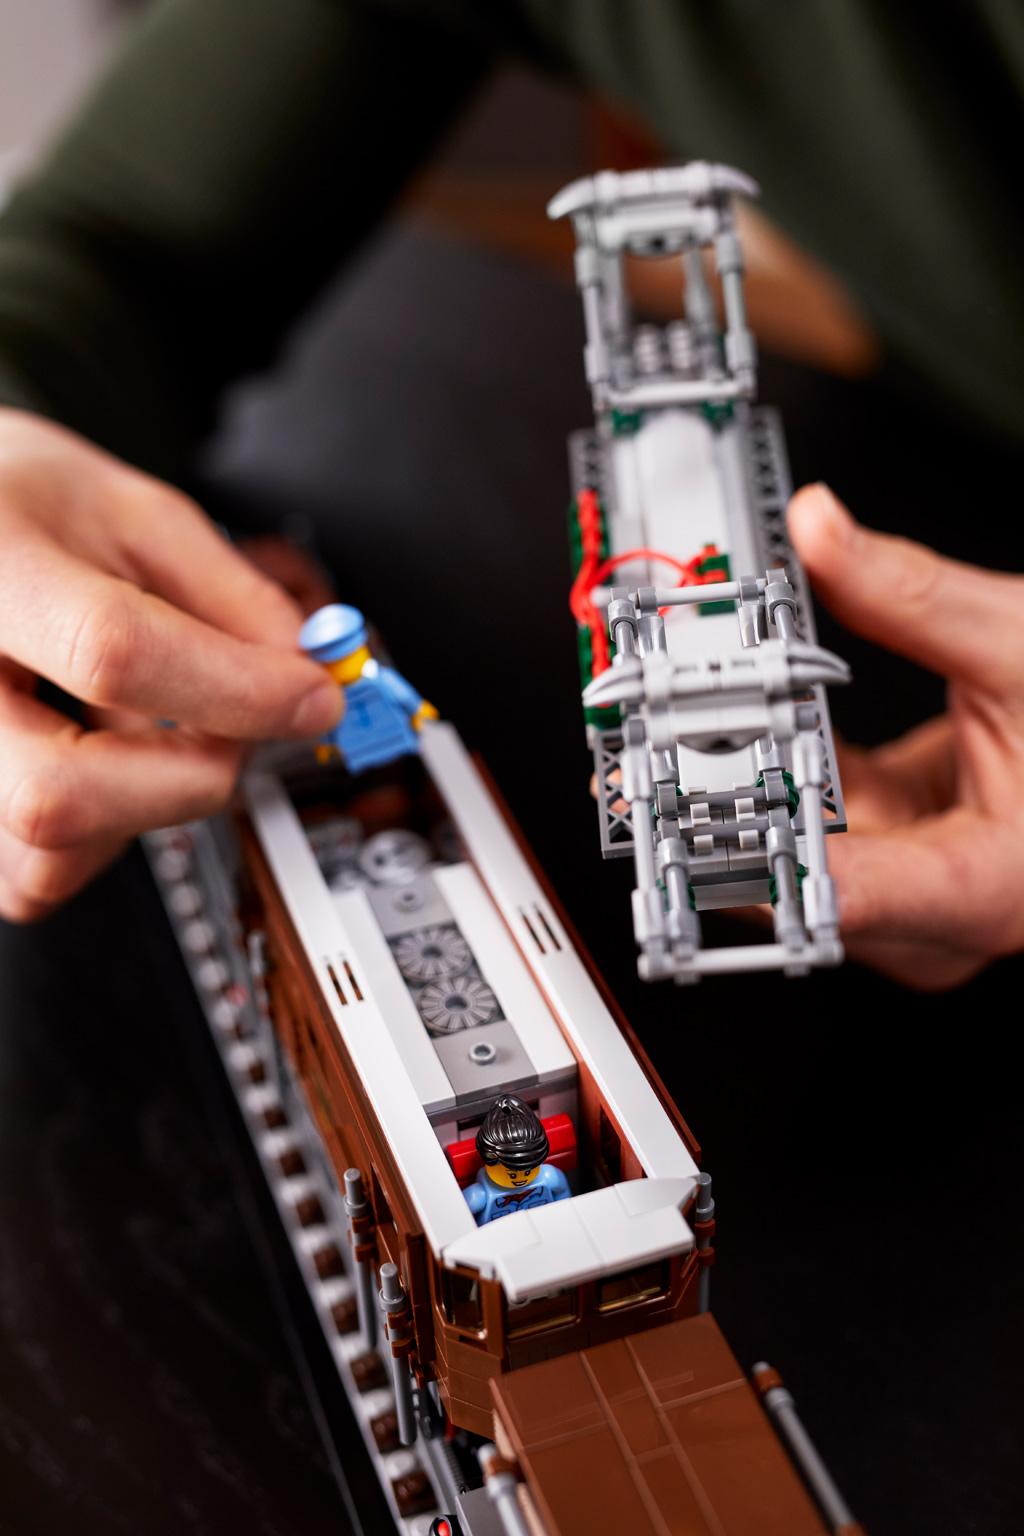 lego-10277-crocodile-locomotive-2020-powered-up-app-2 zusammengebaut.com